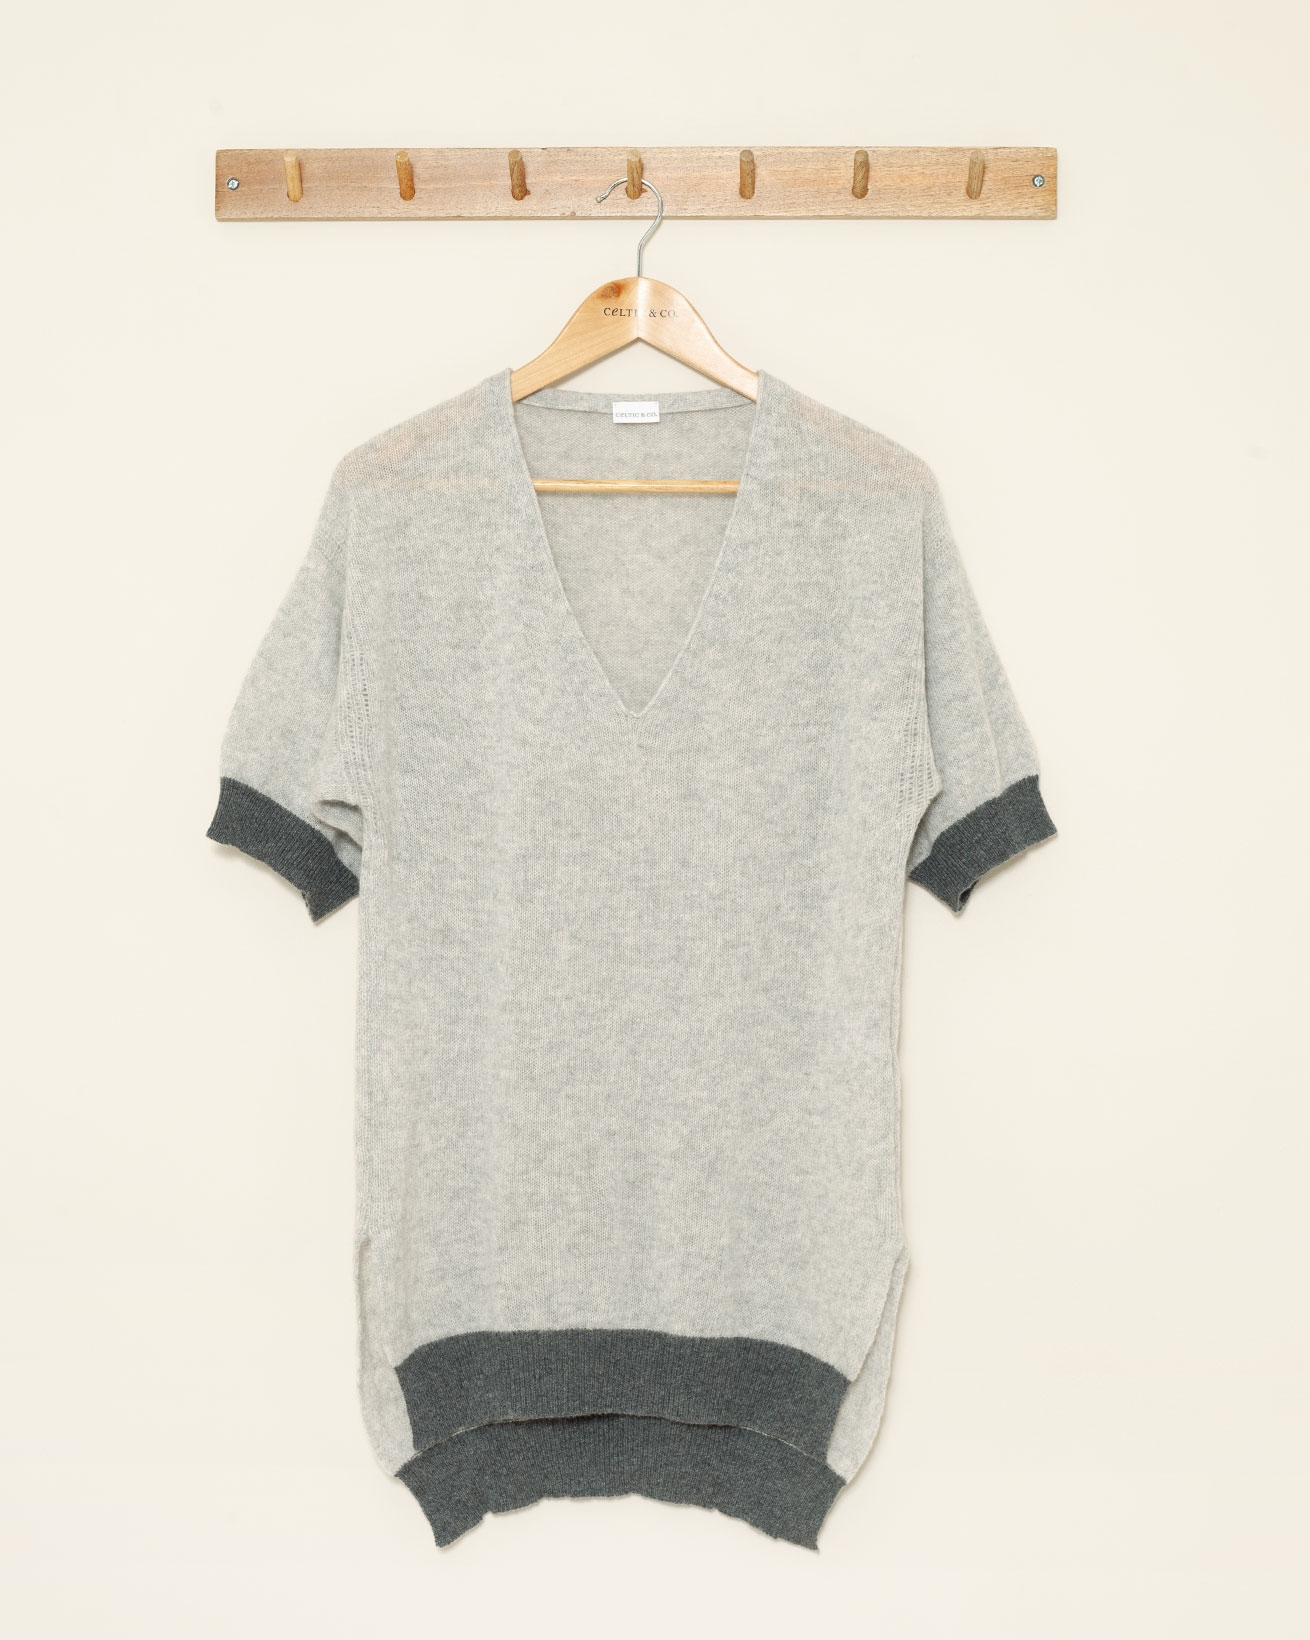 Cashmere V Neck Tunic - Large - Grey - 1027a